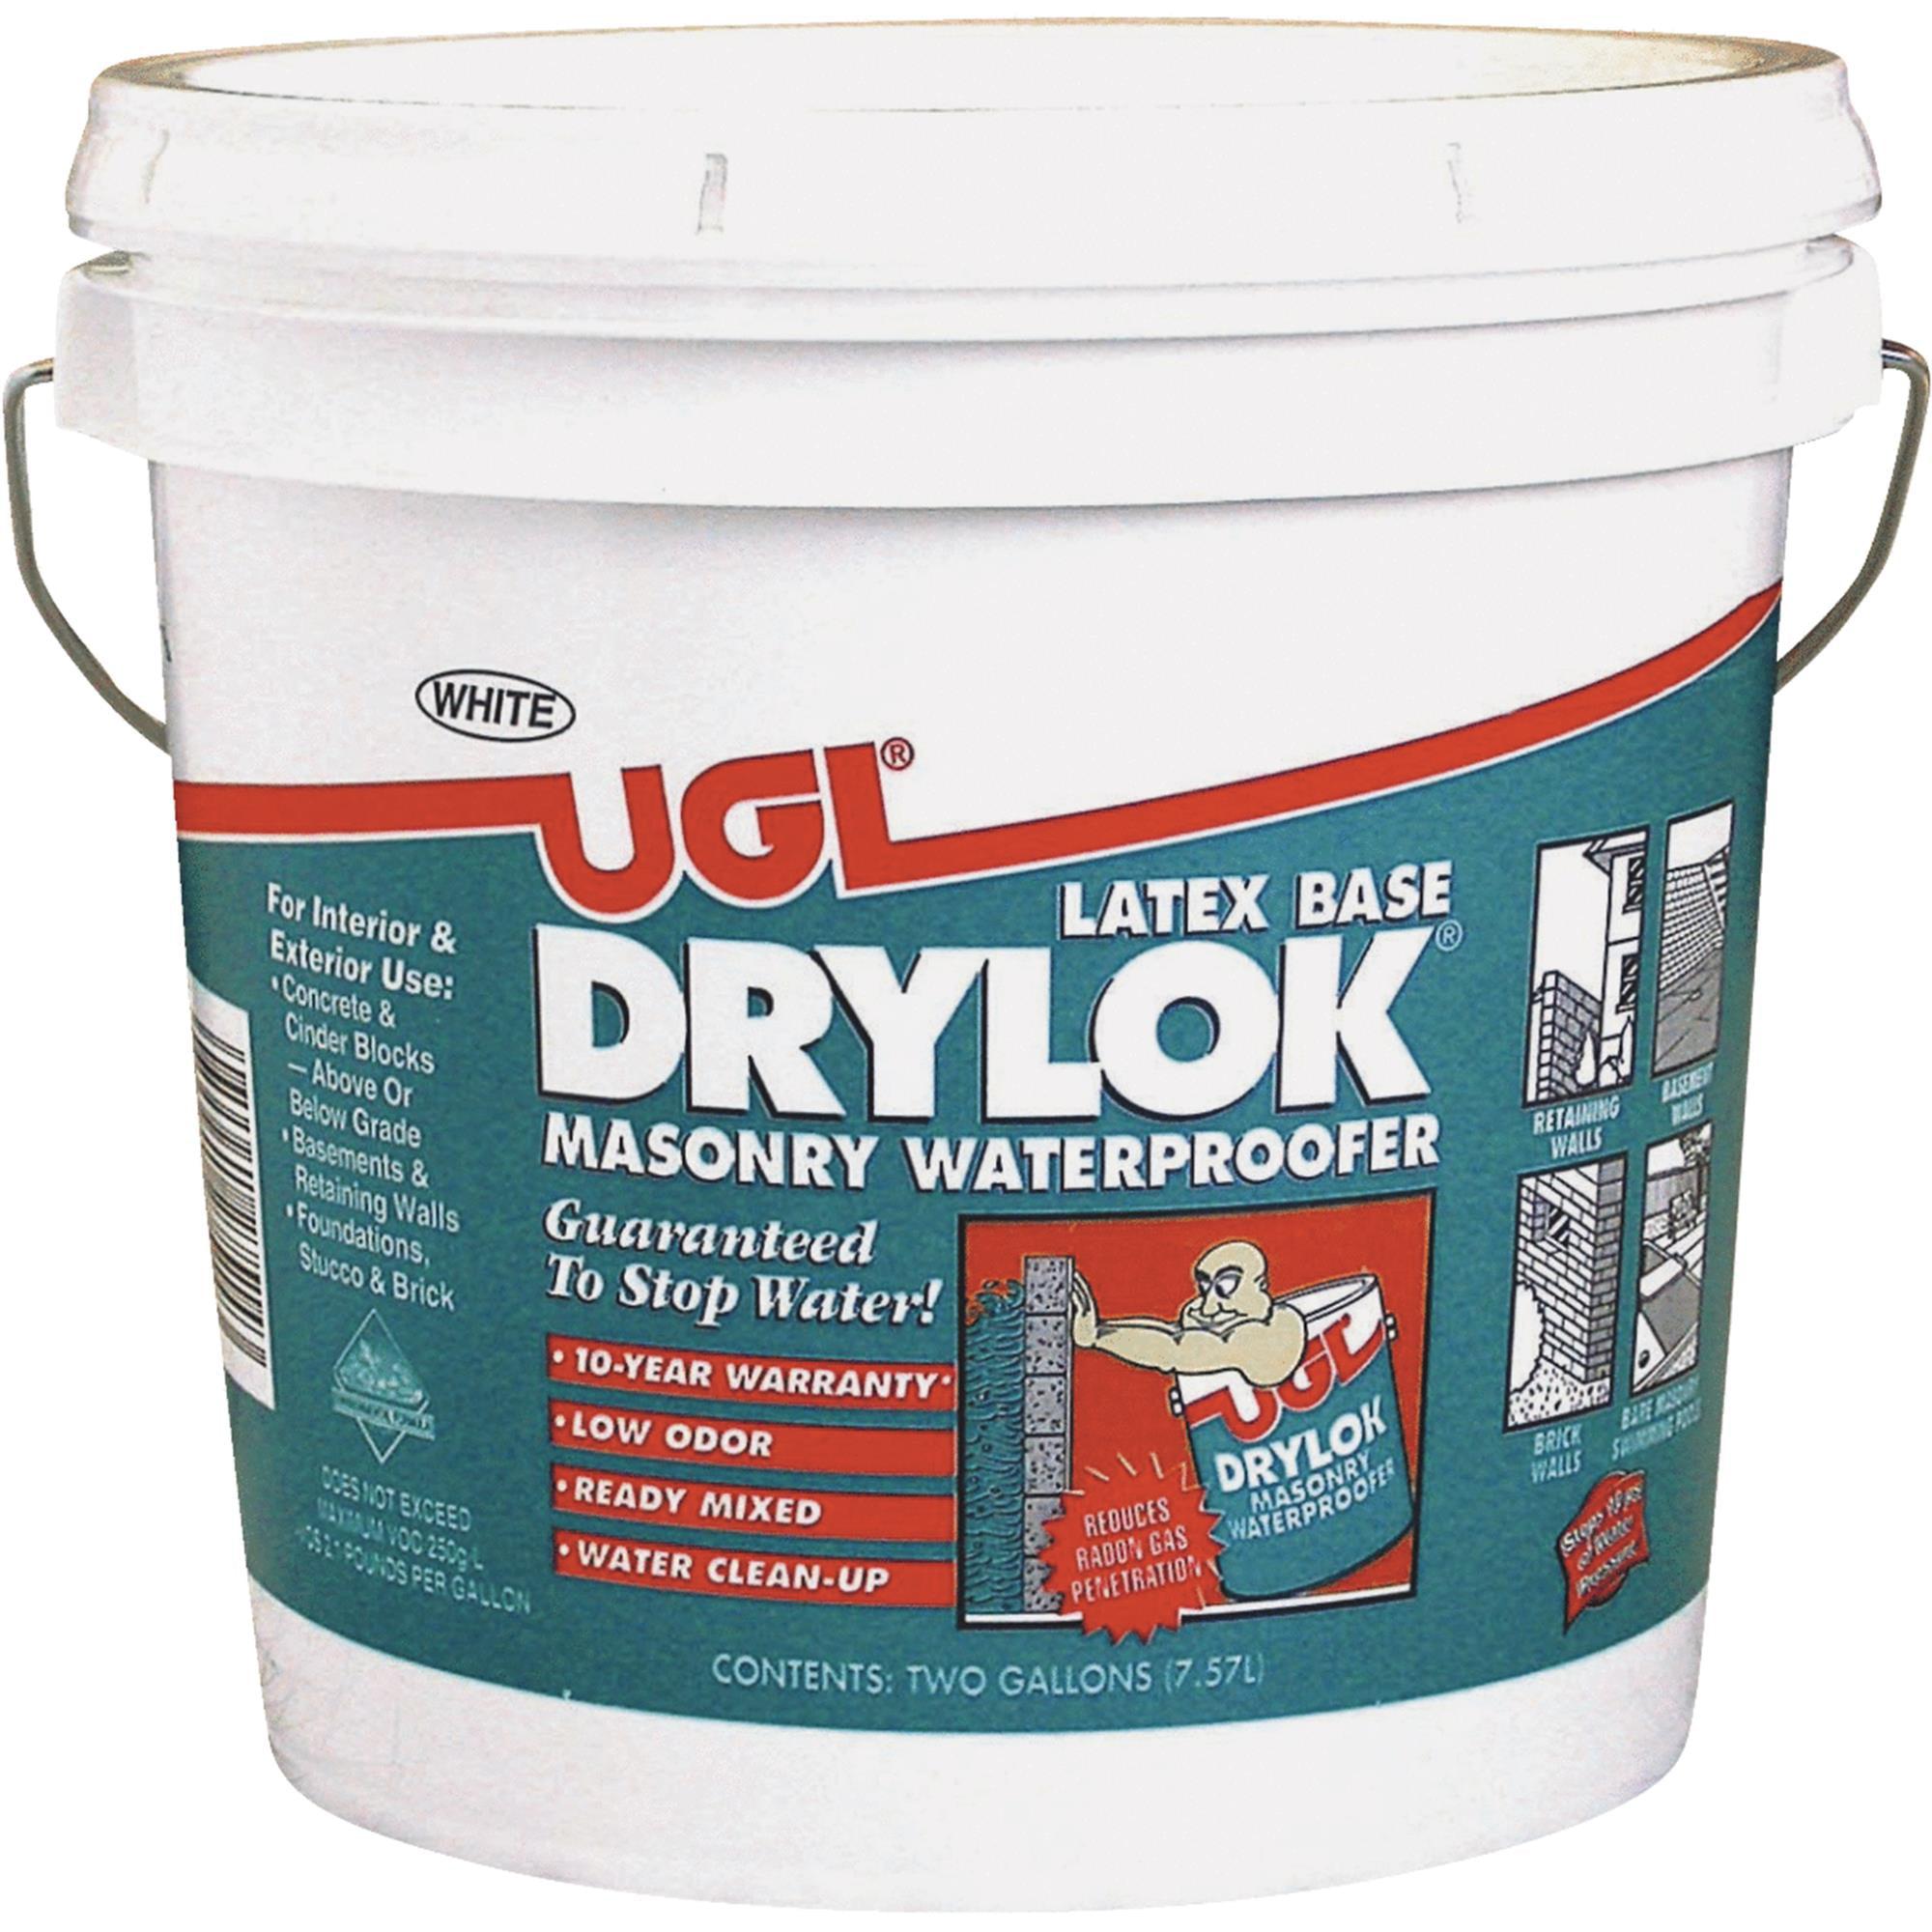 Drylok Latex Masonry Waterproofer by United Gilsonite Lab